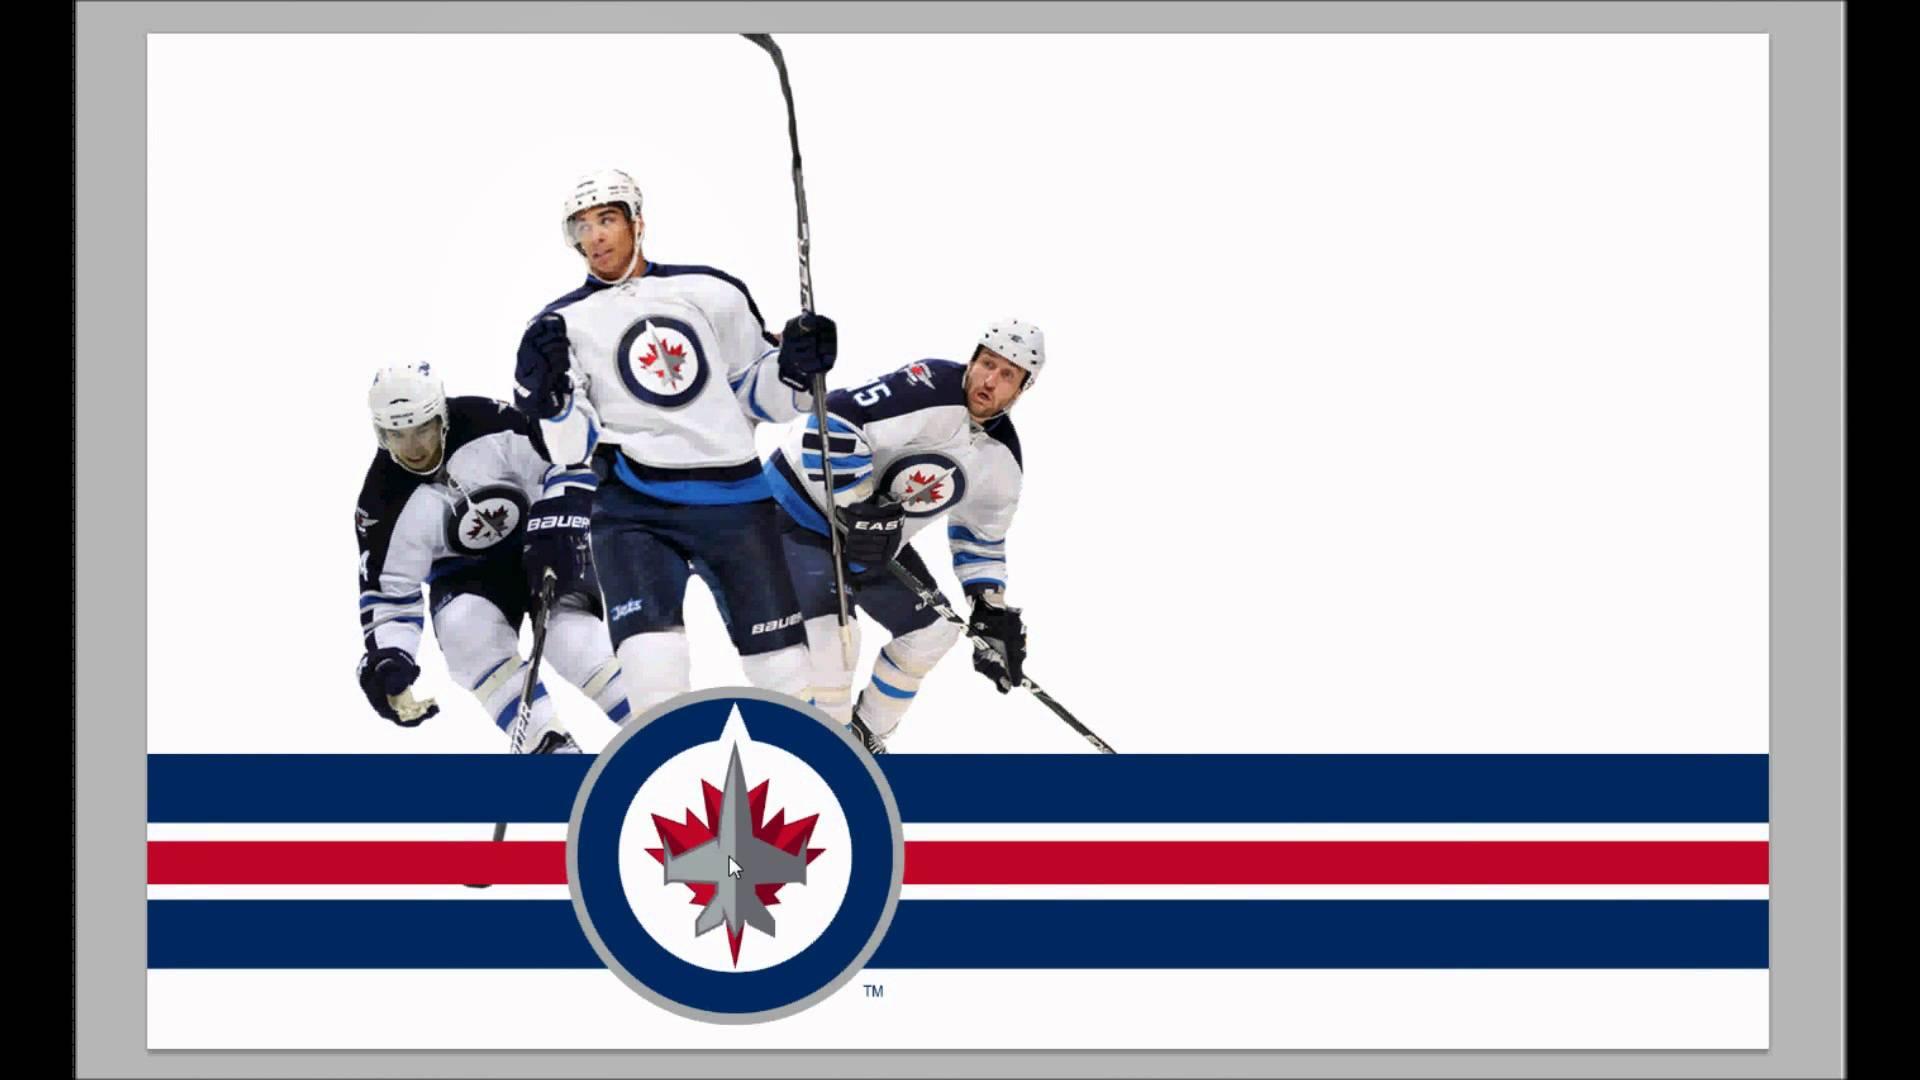 Winnipeg Jets Wallpaper 17   1920 X 1080 stmednet 1920x1080